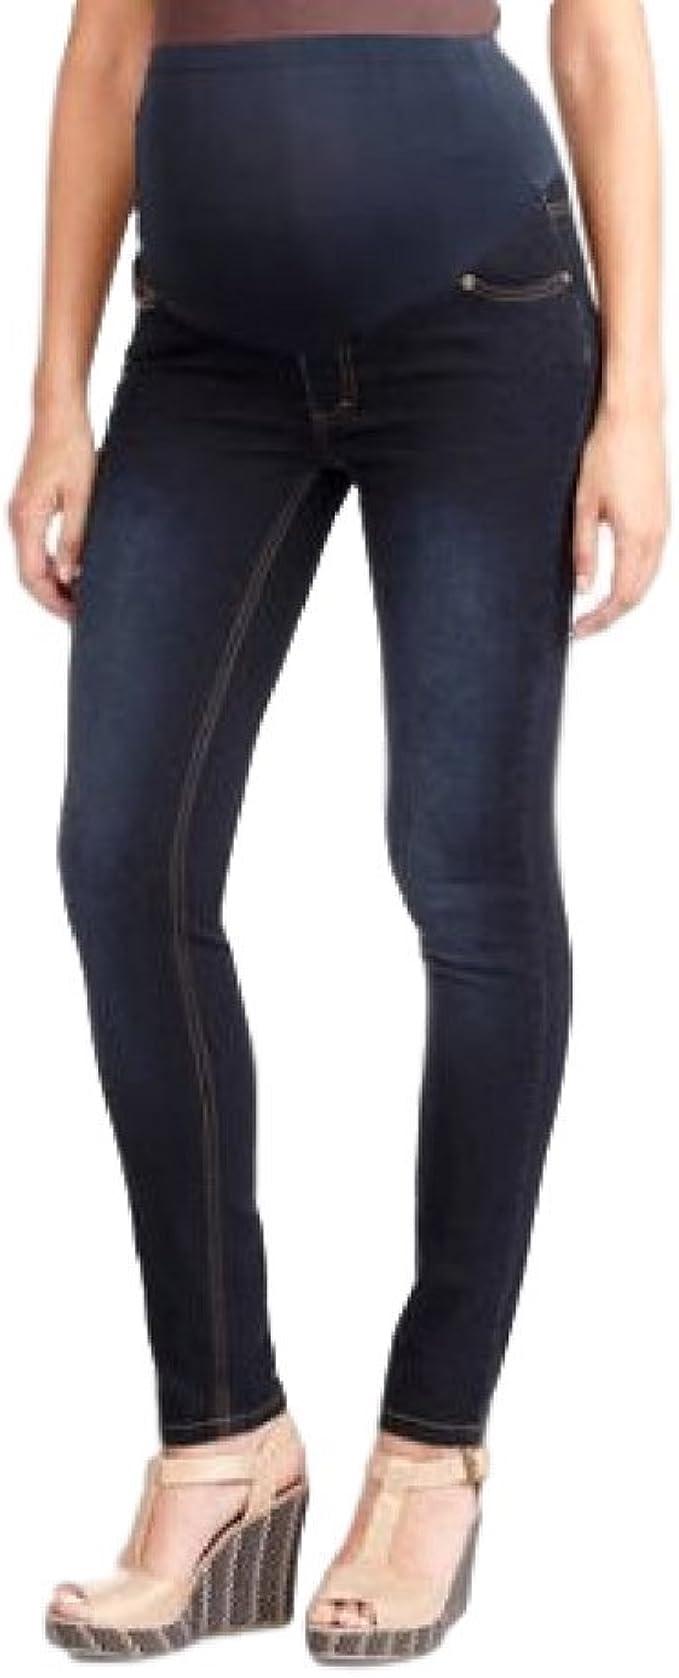 NEW LOOK Black Maternity Over Bump Jenna Jeans Pregnancy Skinny Jeggings Size 8